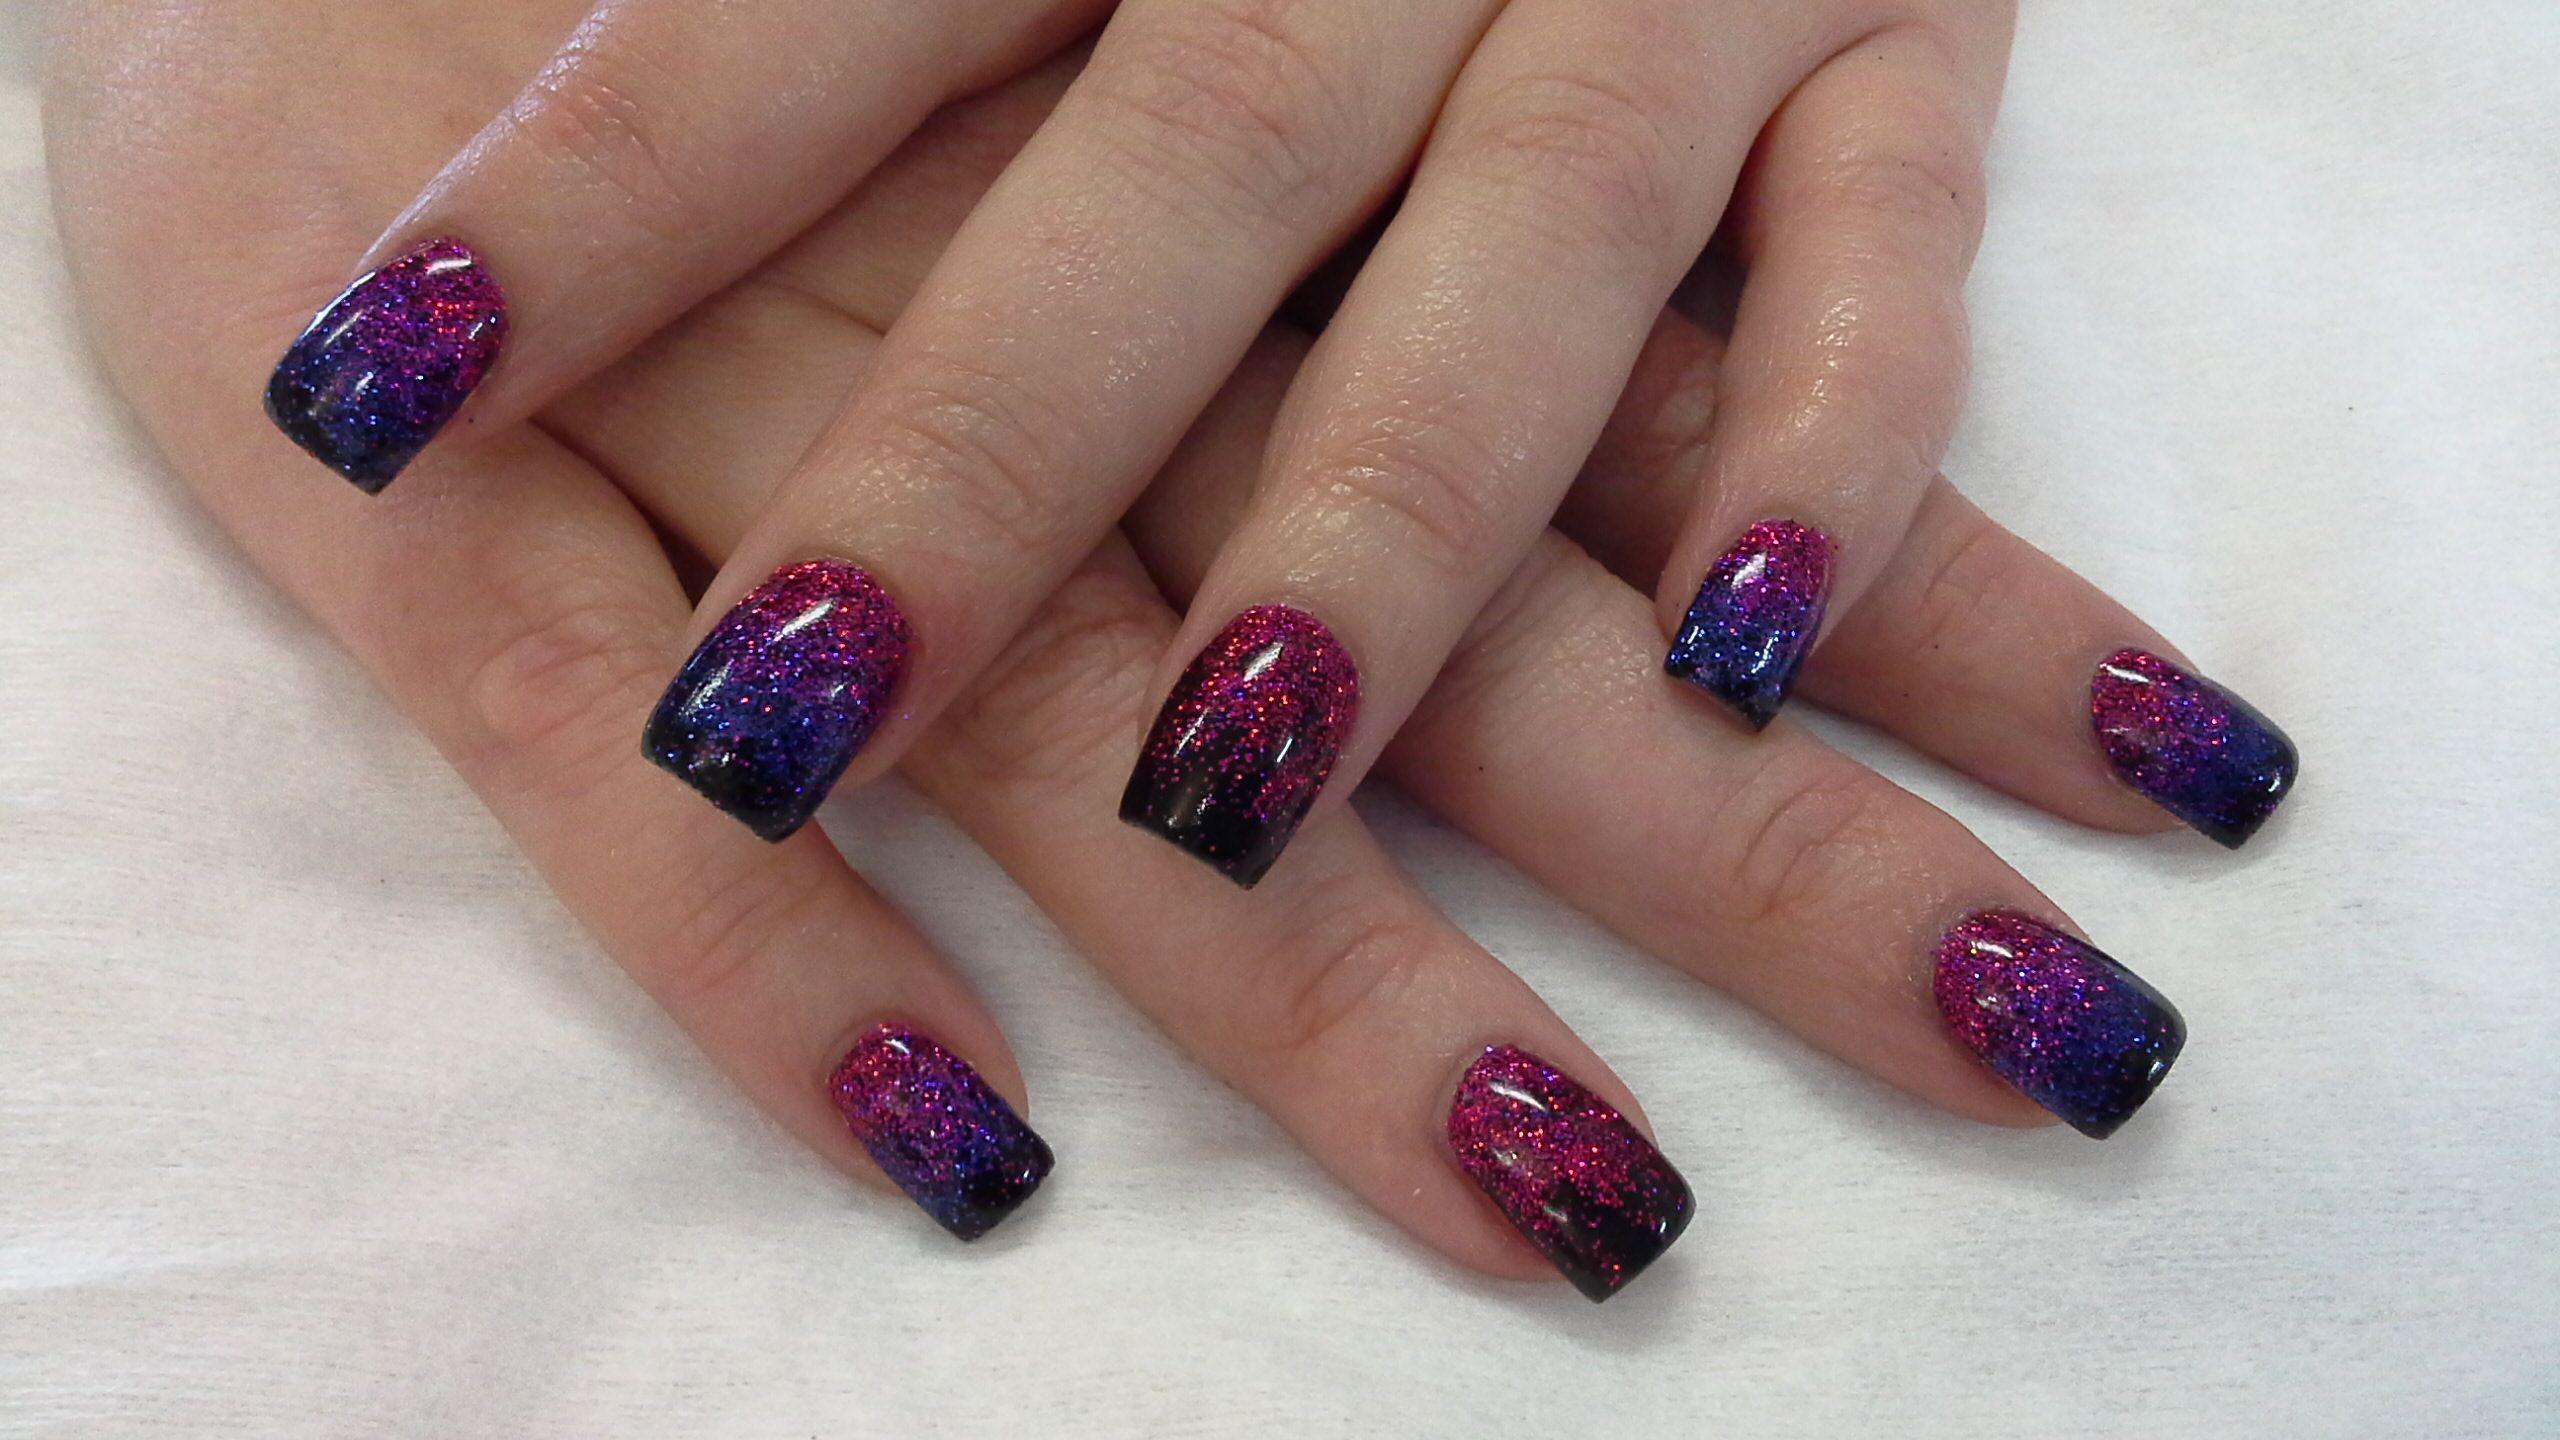 Faded Glitter Nail Designs